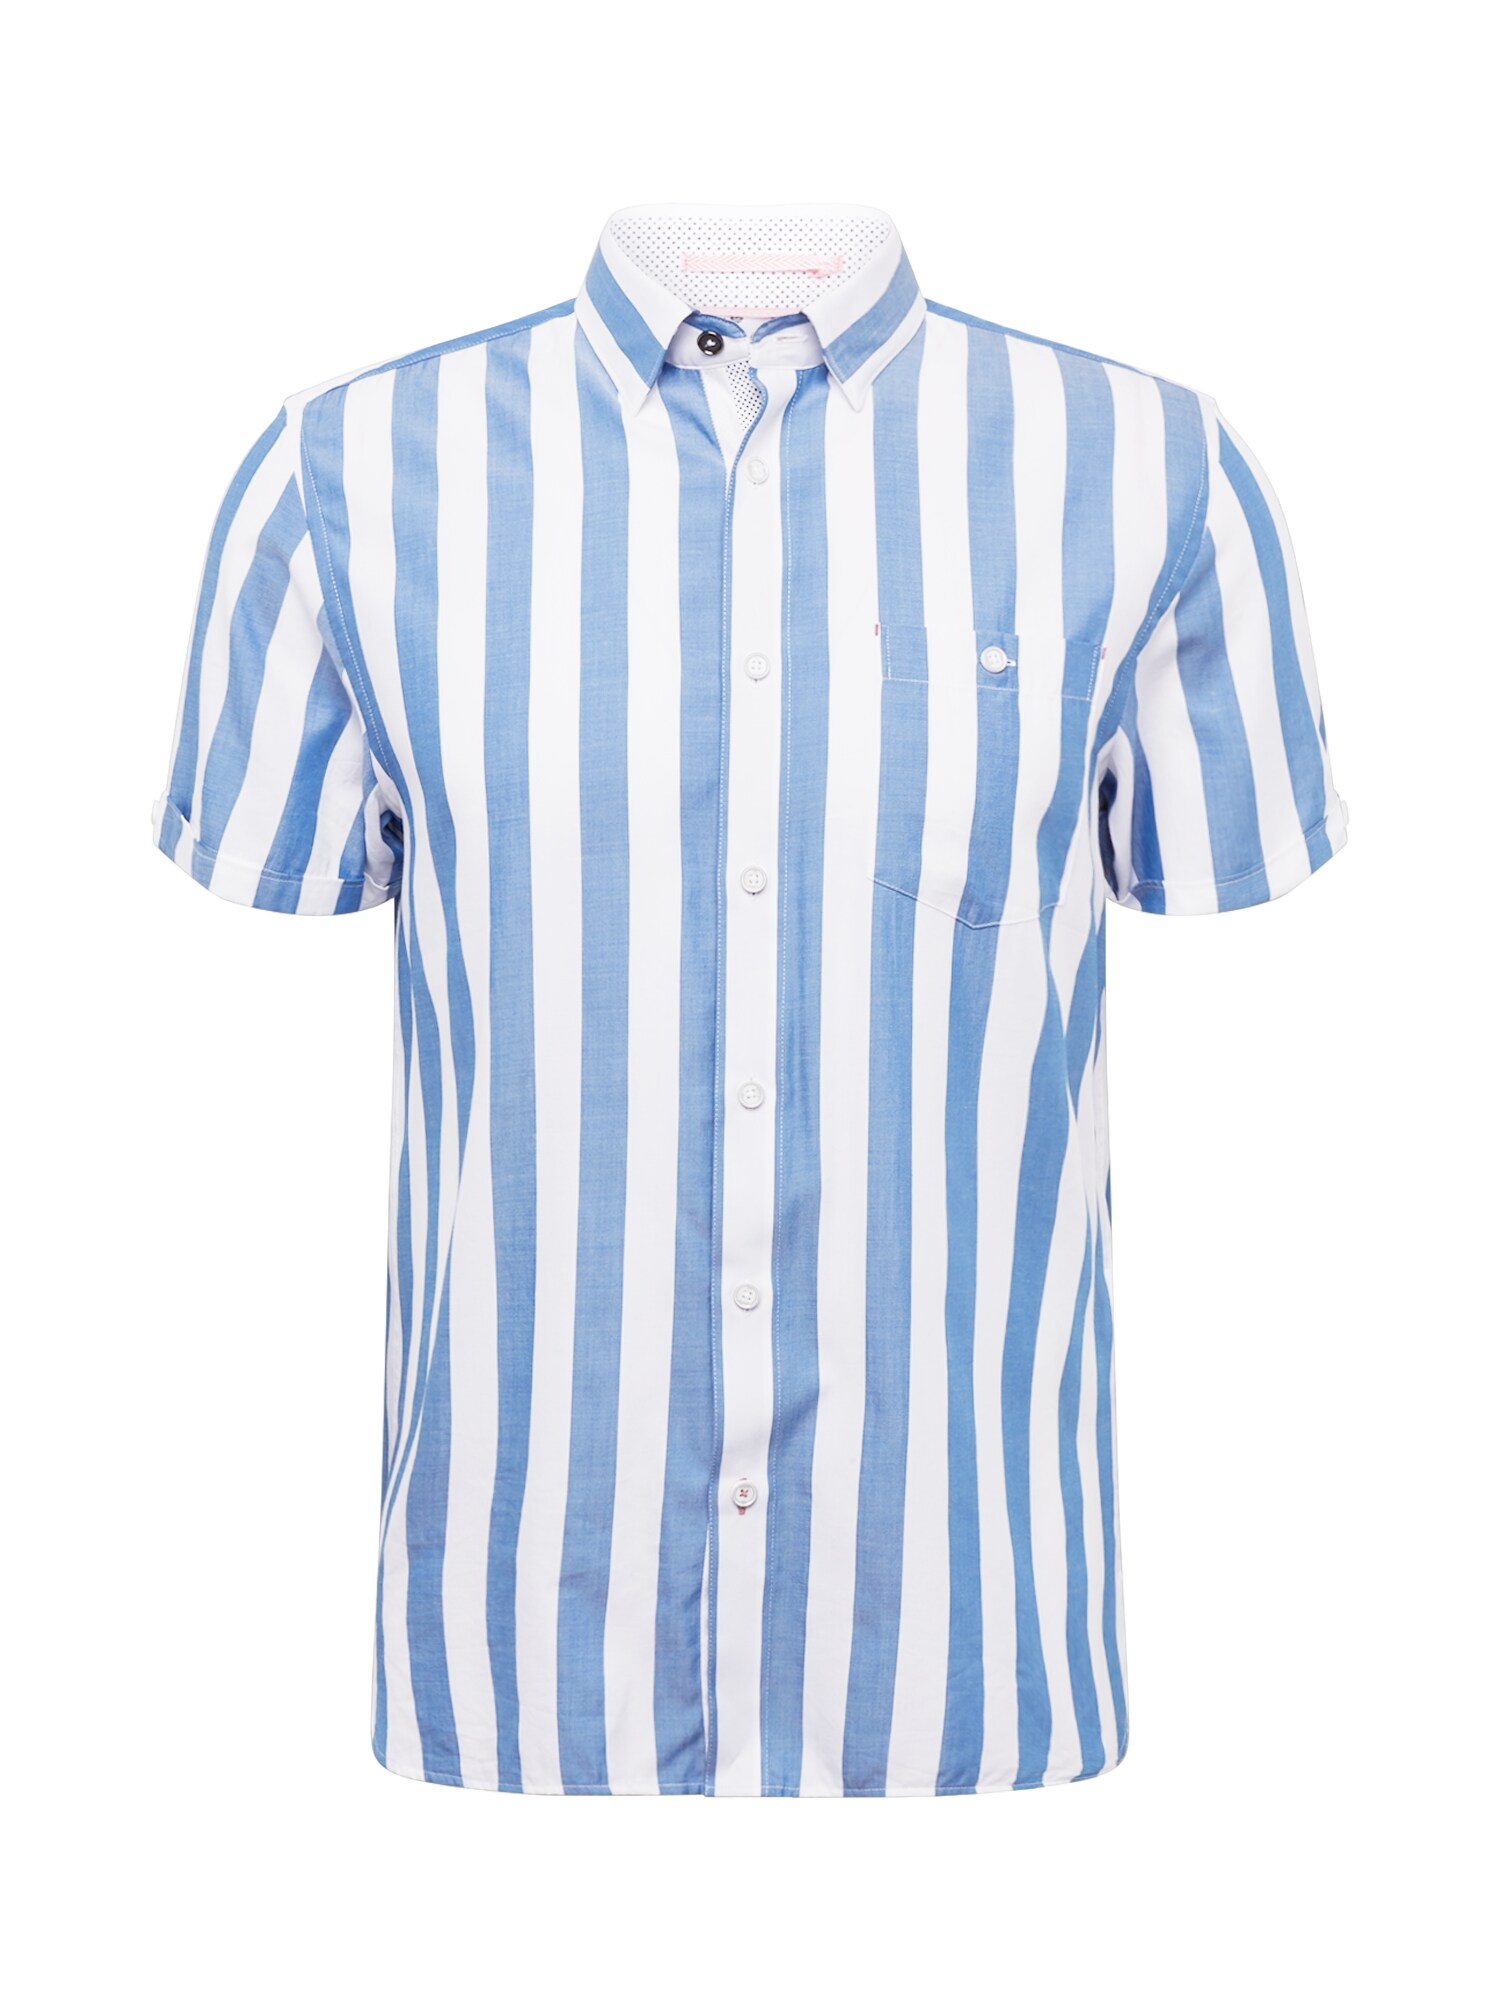 Košile marki modrá bílá Ted Baker